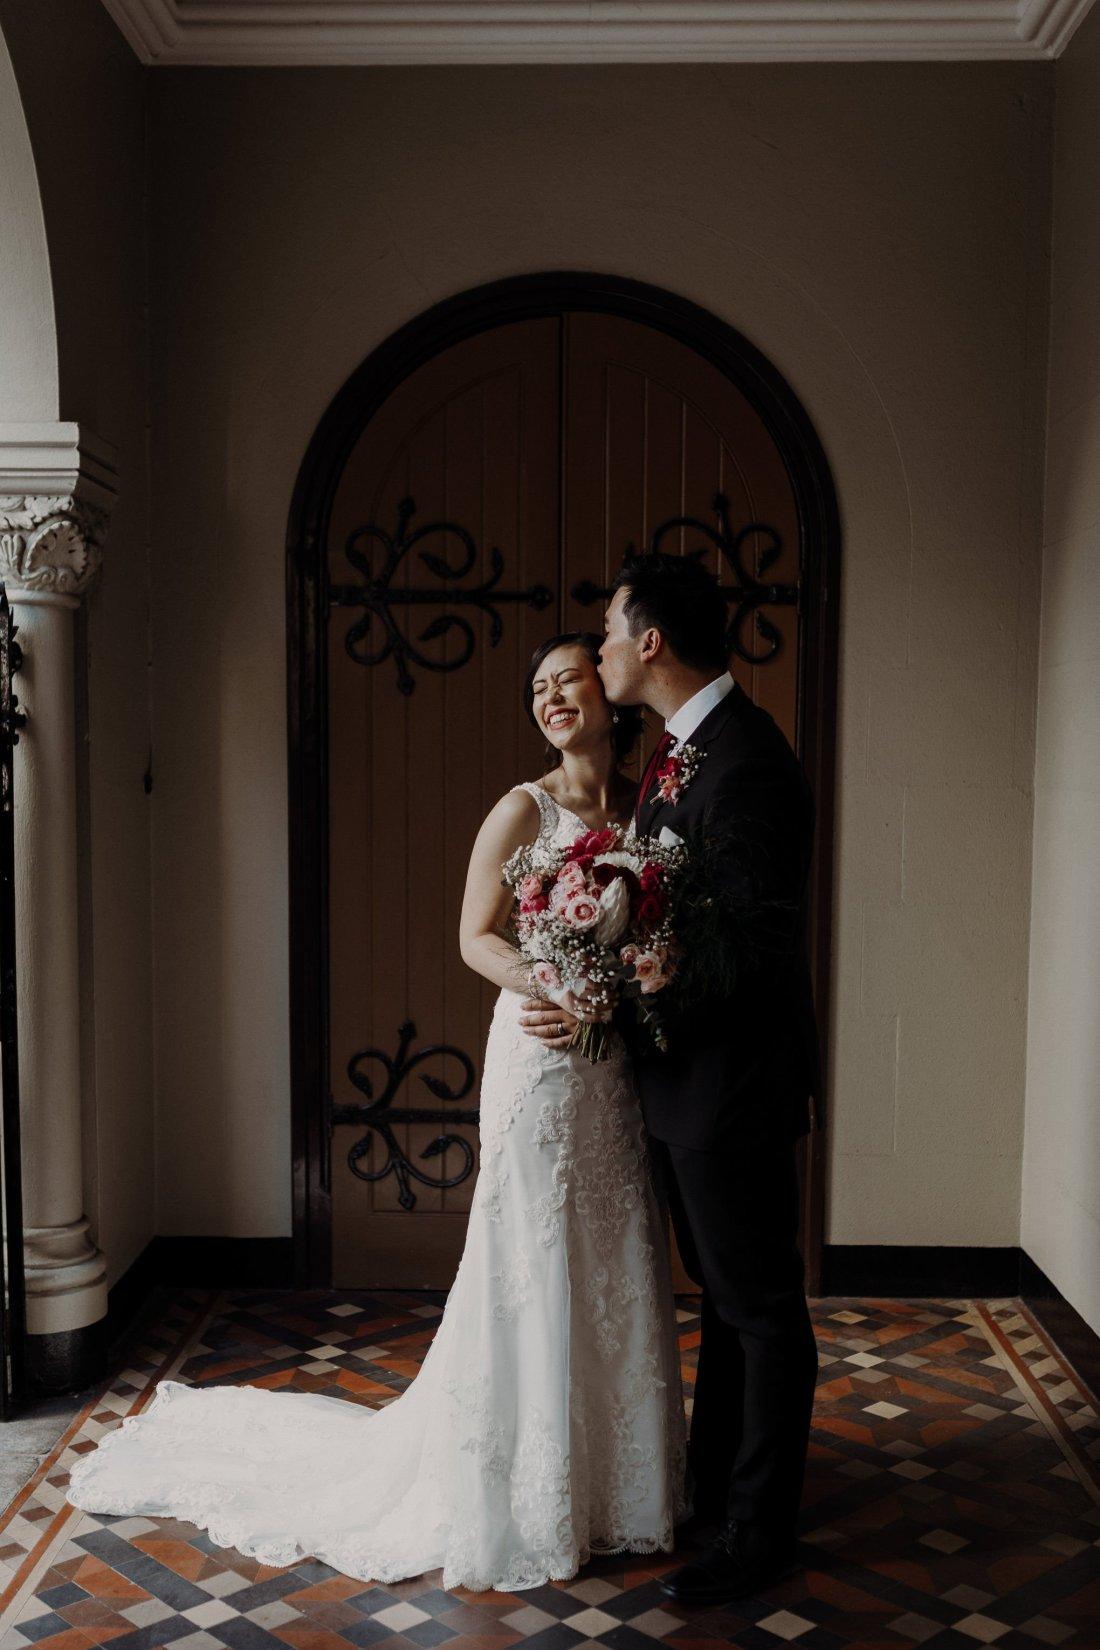 Ebony Blush Photography   Perth Wedding Photographer   Photography + Film   Sandalford Winery   Como Treasury Wedding   Perth City Wedding  Alex + Mel30